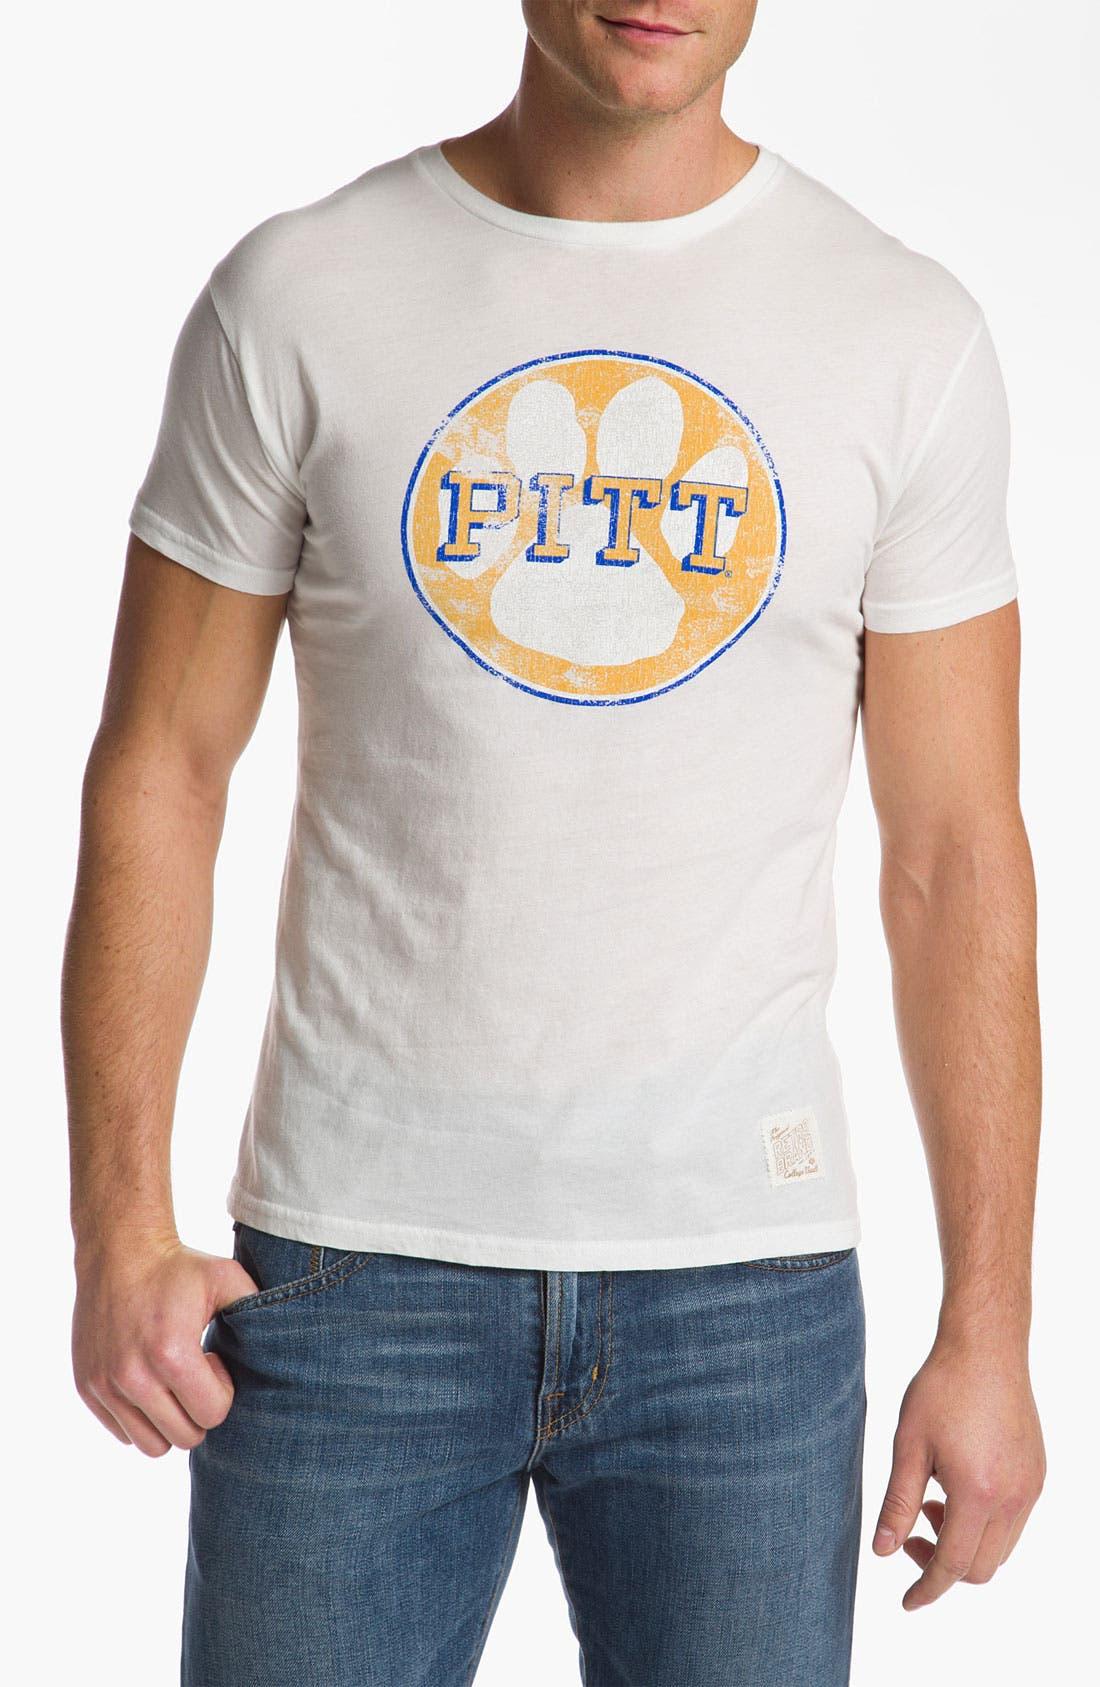 Main Image - The Original Retro Brand 'Pittsburg Panthers' T-Shirt